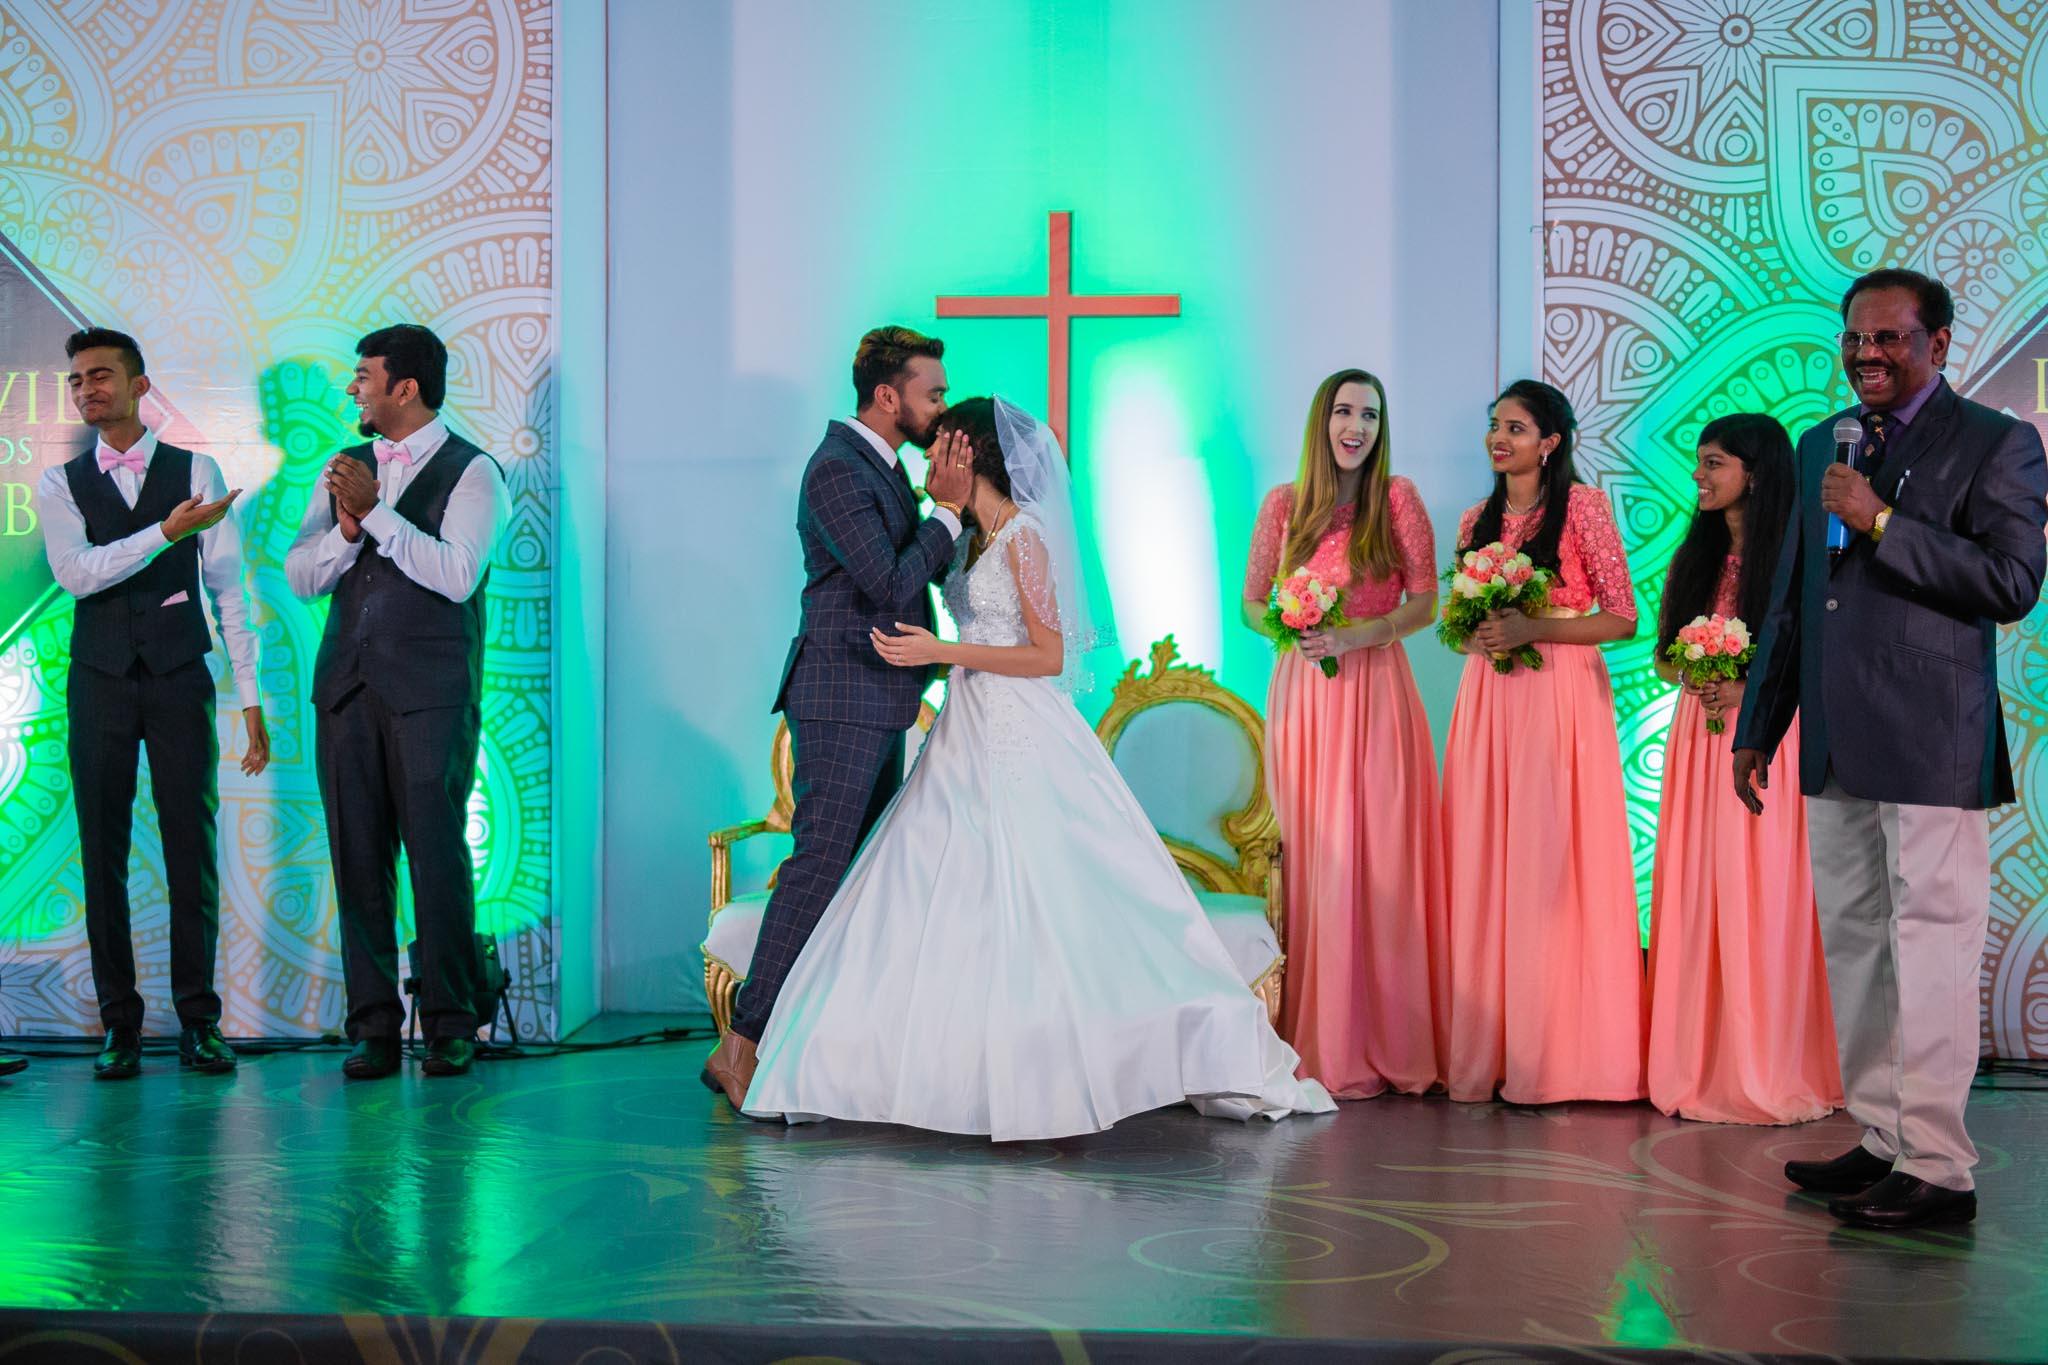 Best-of-2018-wedding-photography-focuz-studios-35